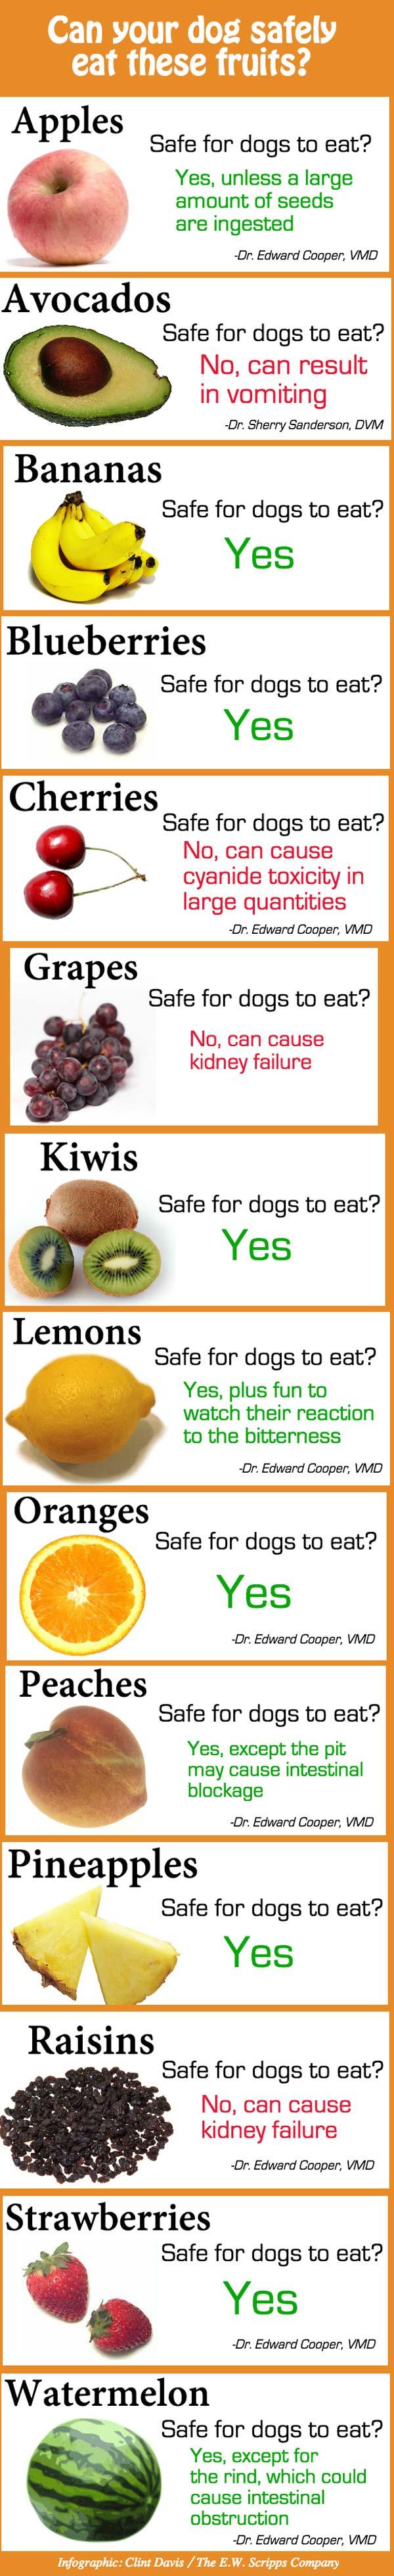 Dog-Food-Safety-Info